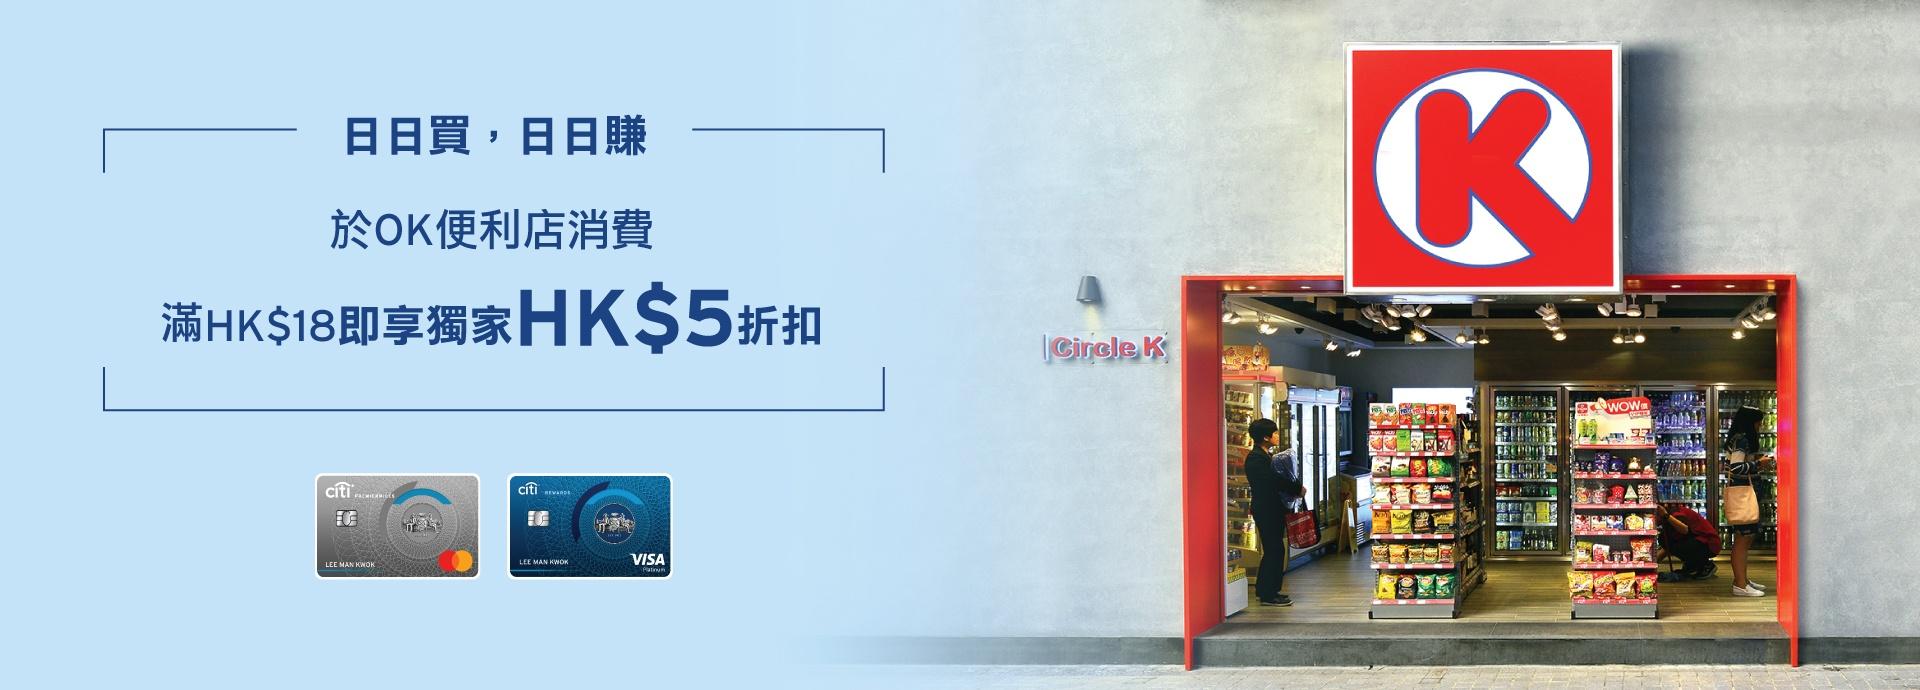 Citibank最新優惠-- 用Citi信用卡綁定Apple Pay/Google Pay/Samsung Pay及感應式付款有優惠